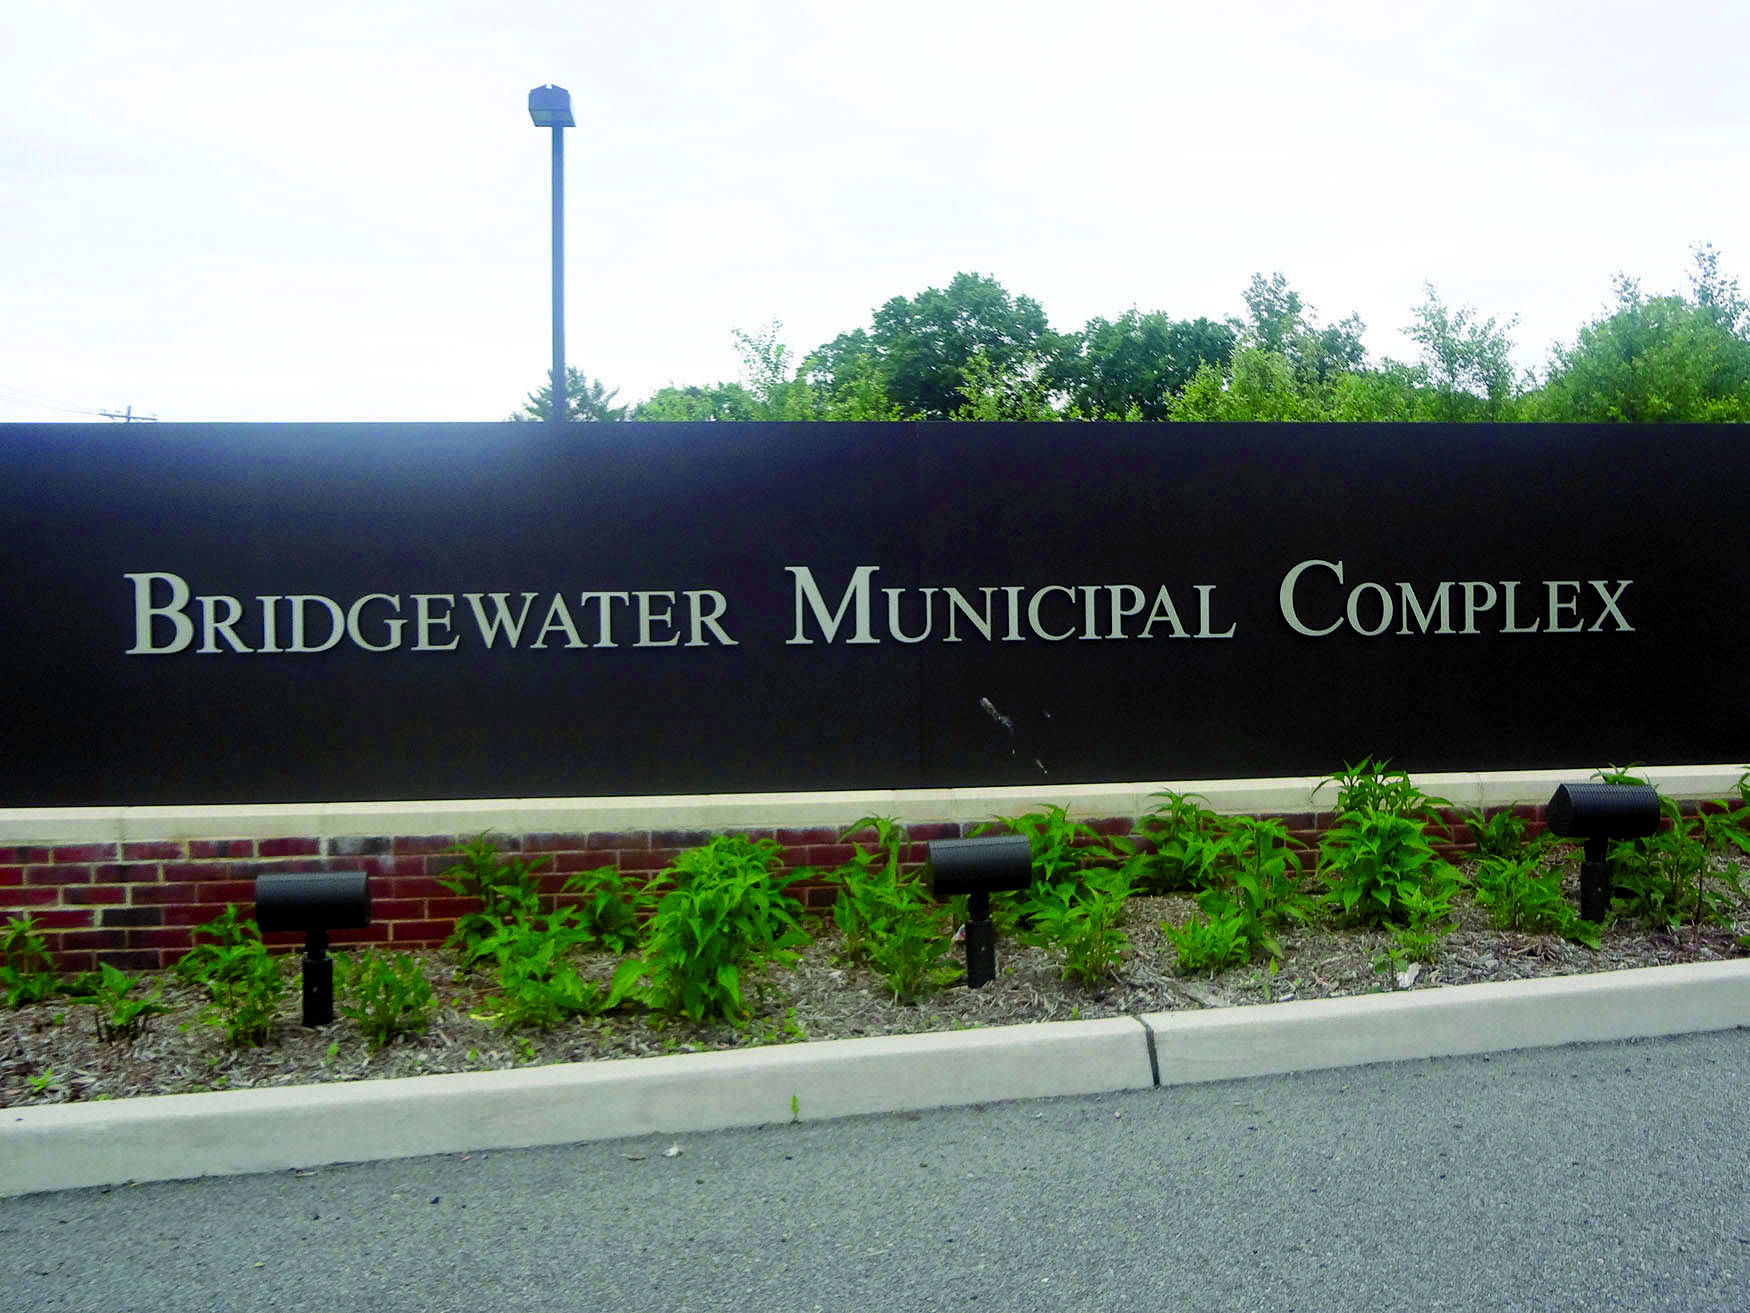 69e7825ad0bcf69db482_Bridgewater_municipal.jpg